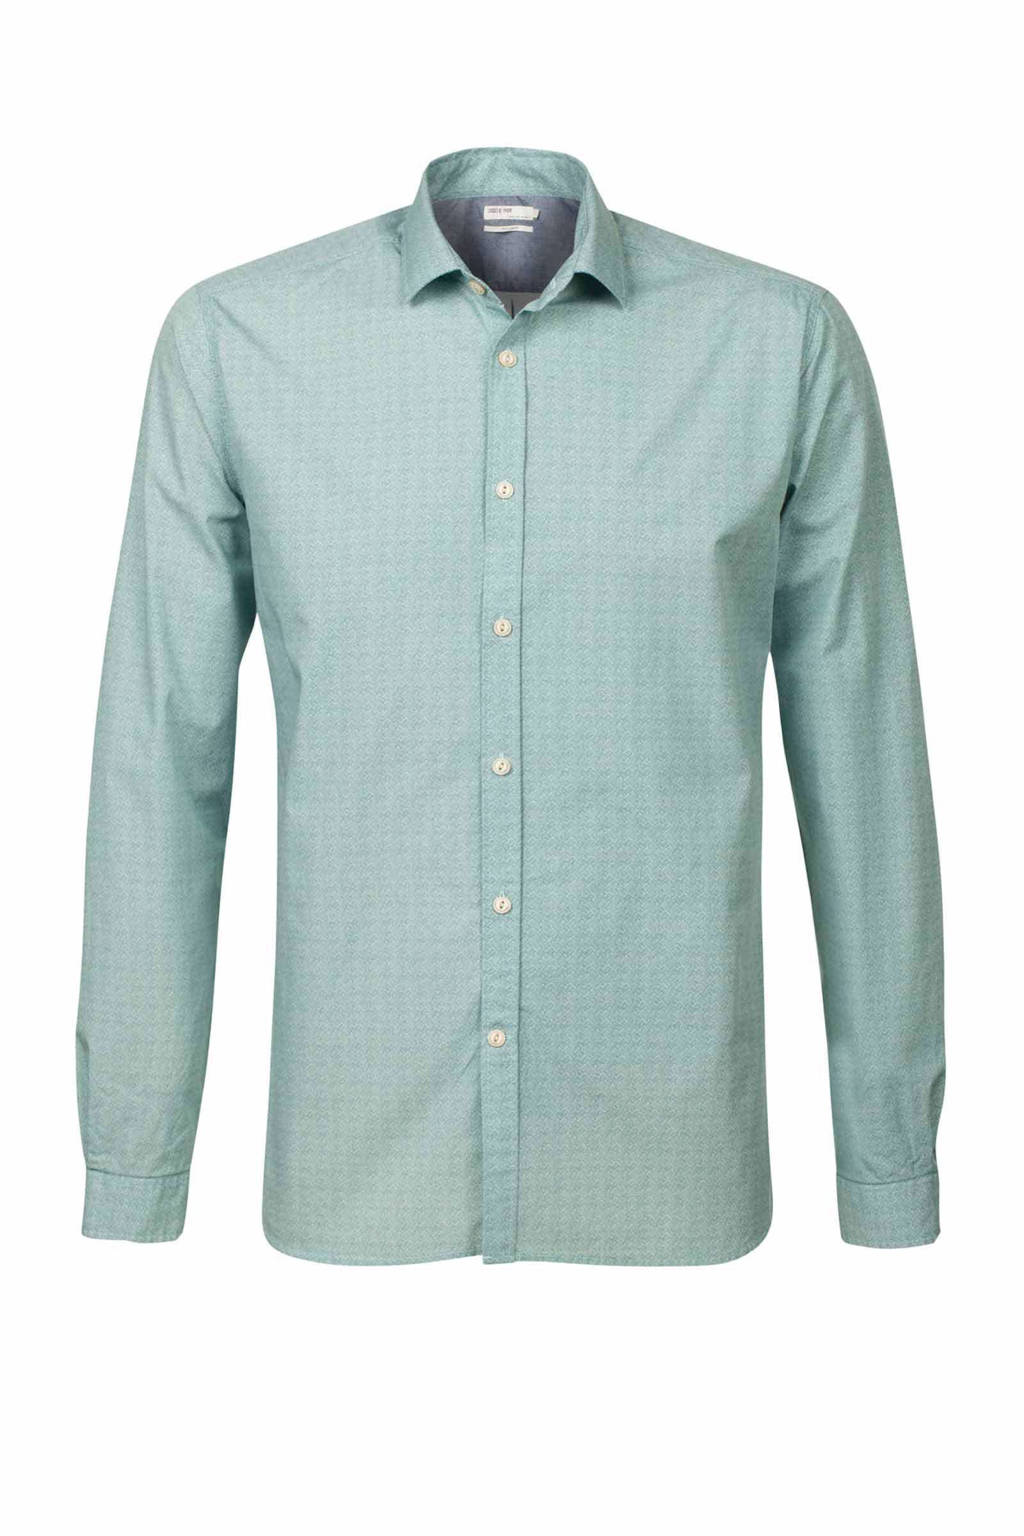 Overhemd Mintgroen.Sissy Boy Regular Overhemd Wehkamp